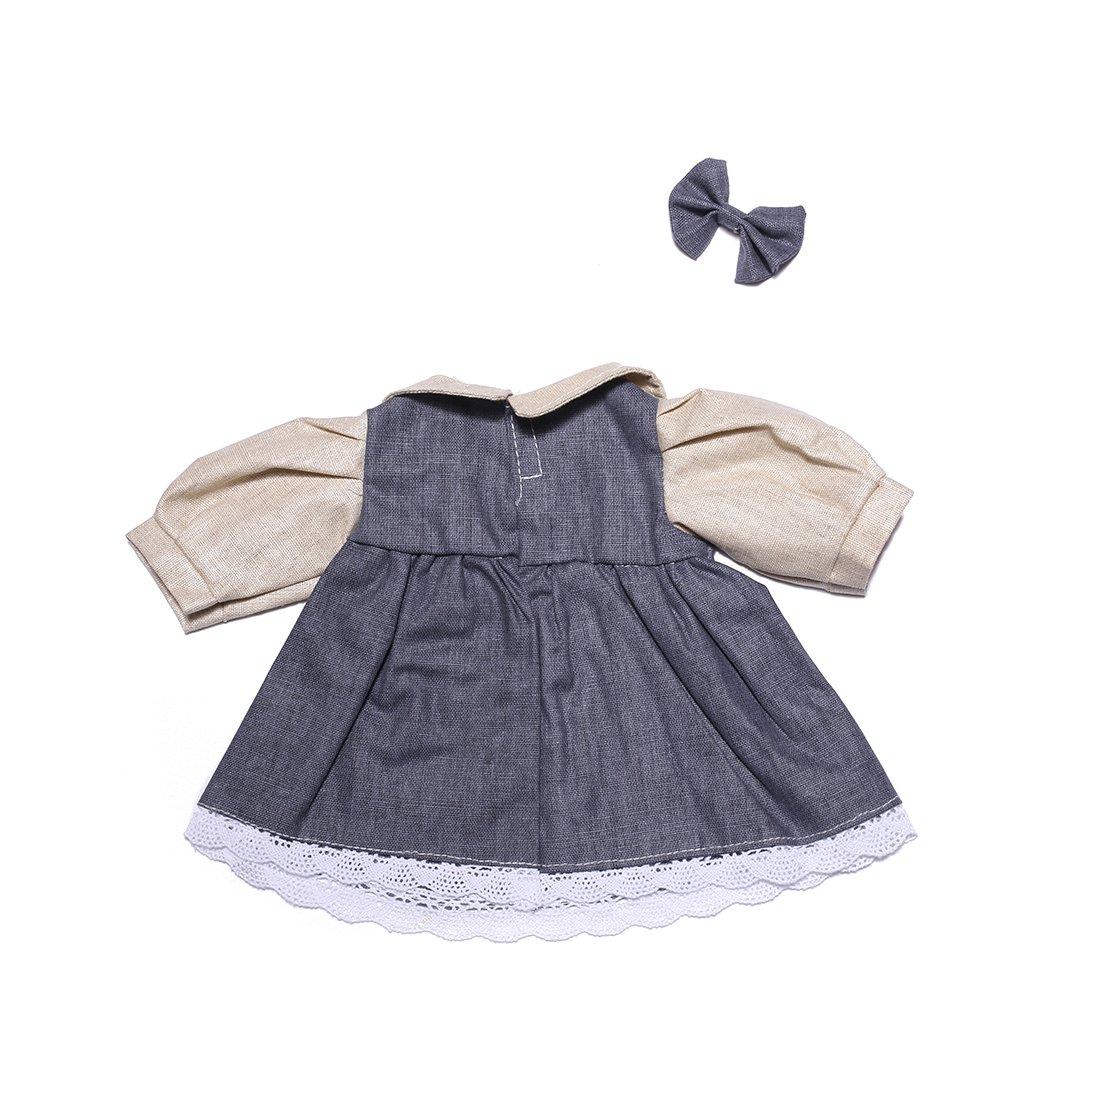 Teddybär Kleidung passend für 15 Build a Bear Babypuppen